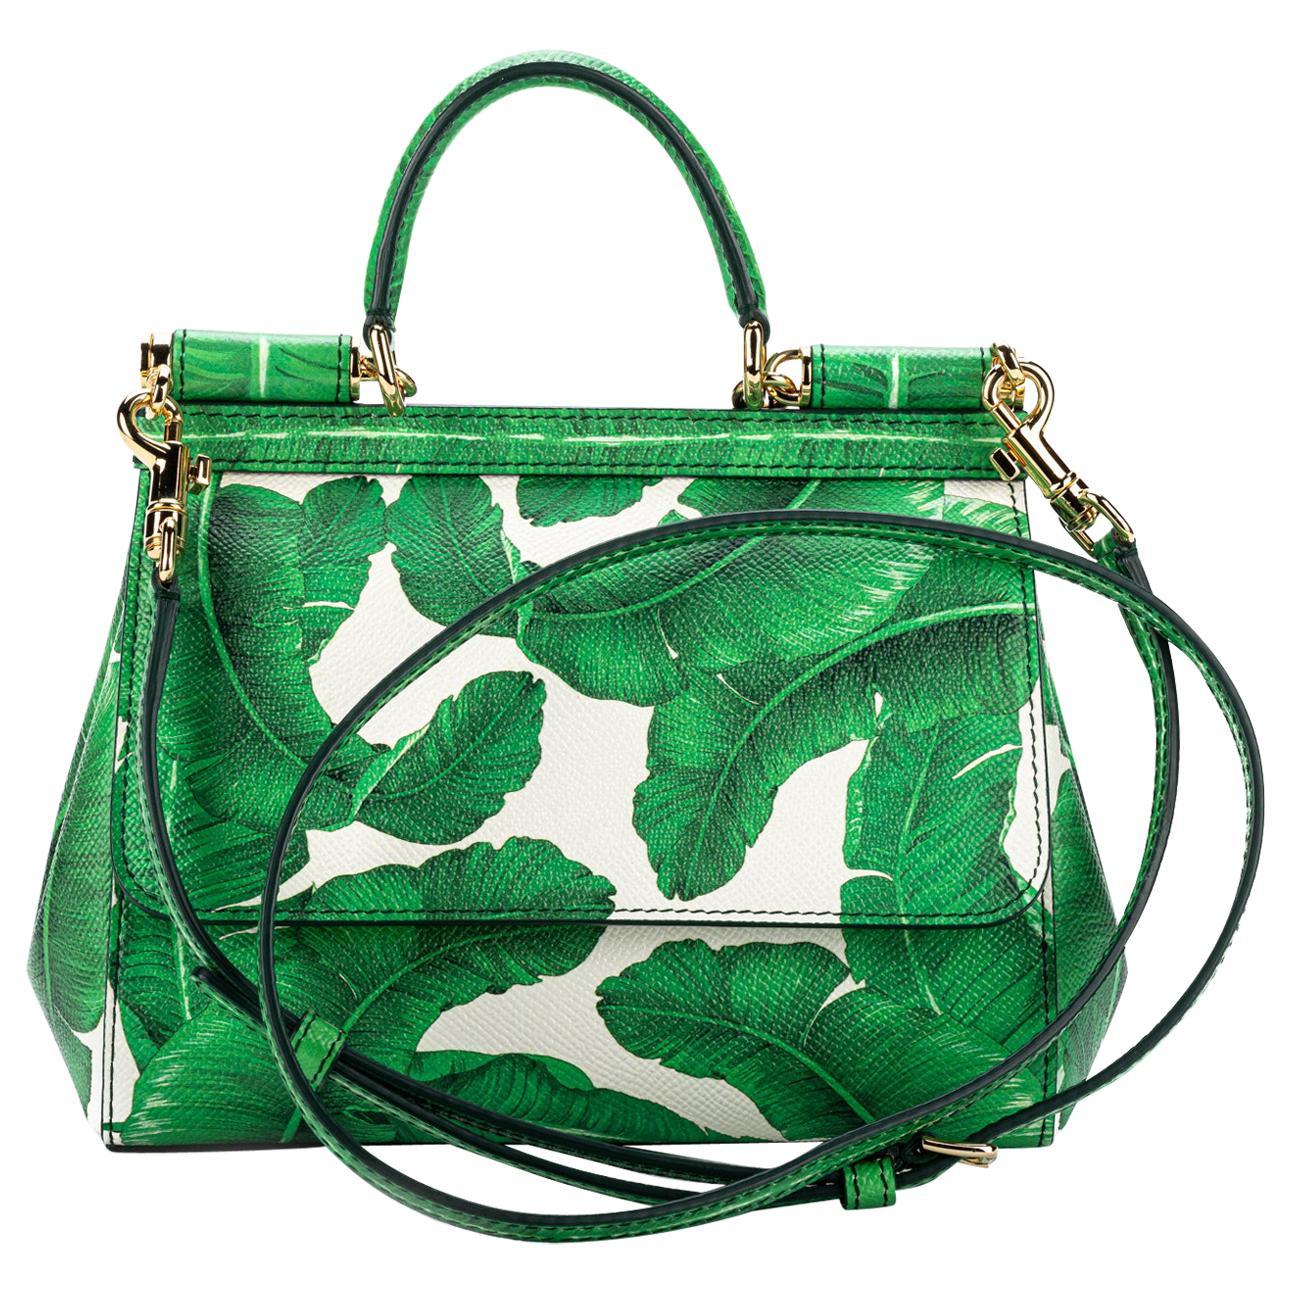 New Dolce & Gabbana Banana Leaf Sicily Bag